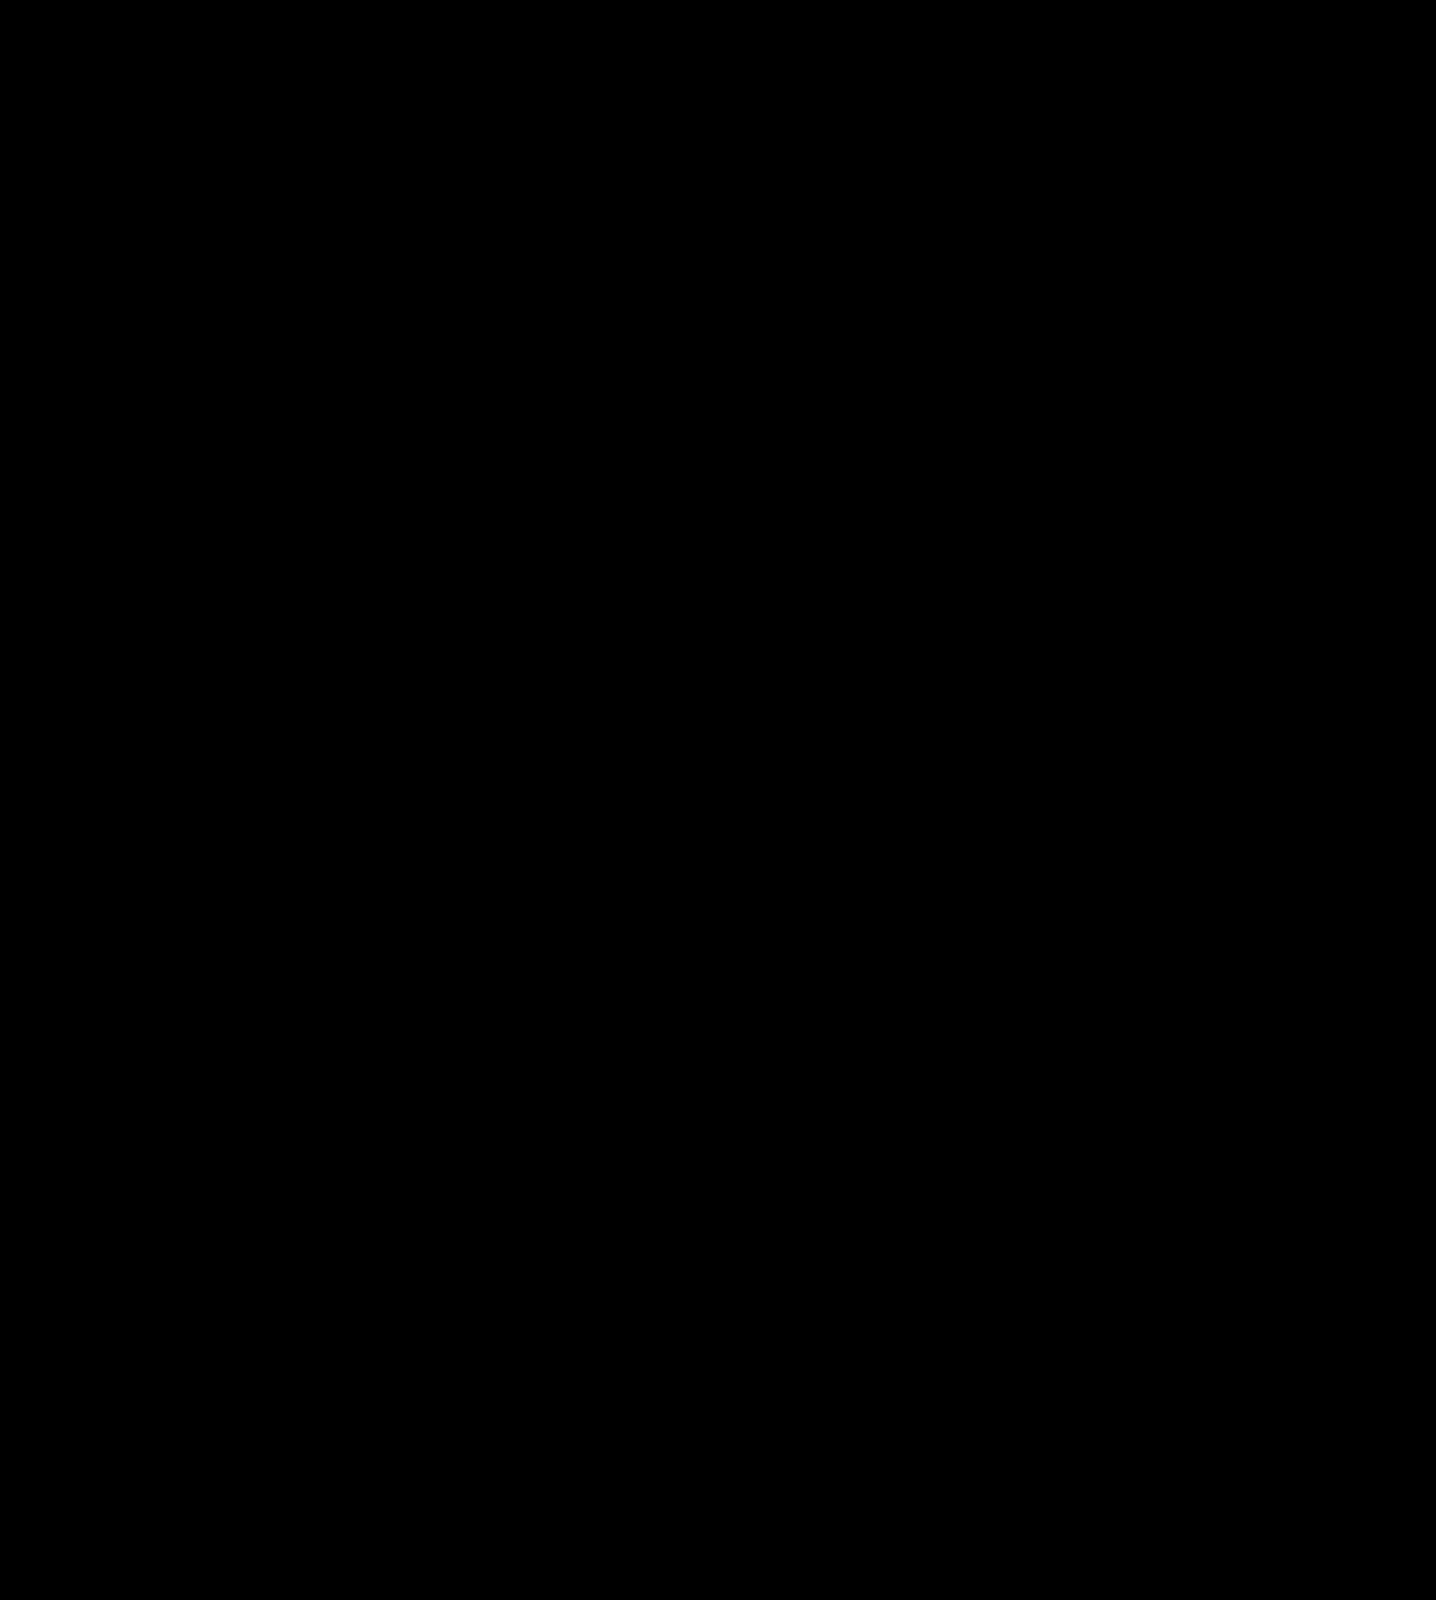 mountaineer, climb, silhouette, climbing sport, mountaineering, climber, secure, rock, rock climbing, rope, extreme sports, steep, climbing rope, sport, leisure, descent, experience, adventure, sport climbing, backlighting